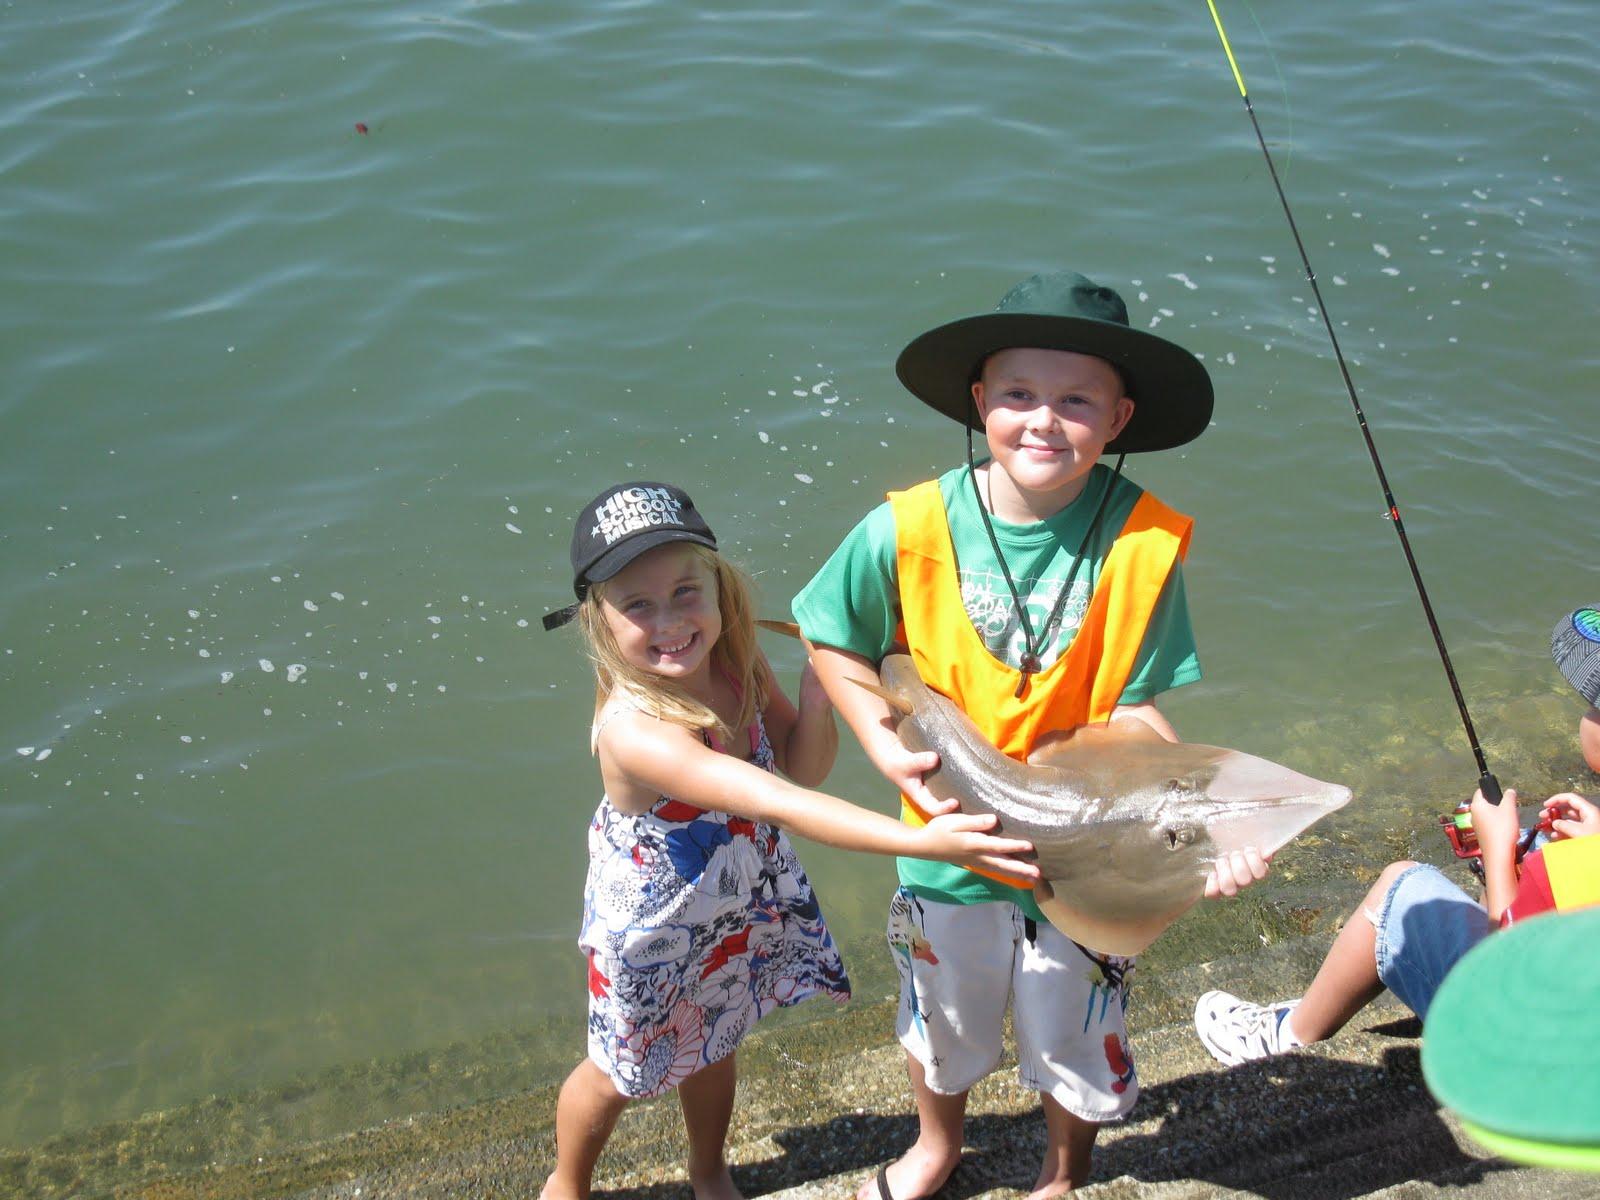 Take a kid fishing day 2011 for Take a kid fishing